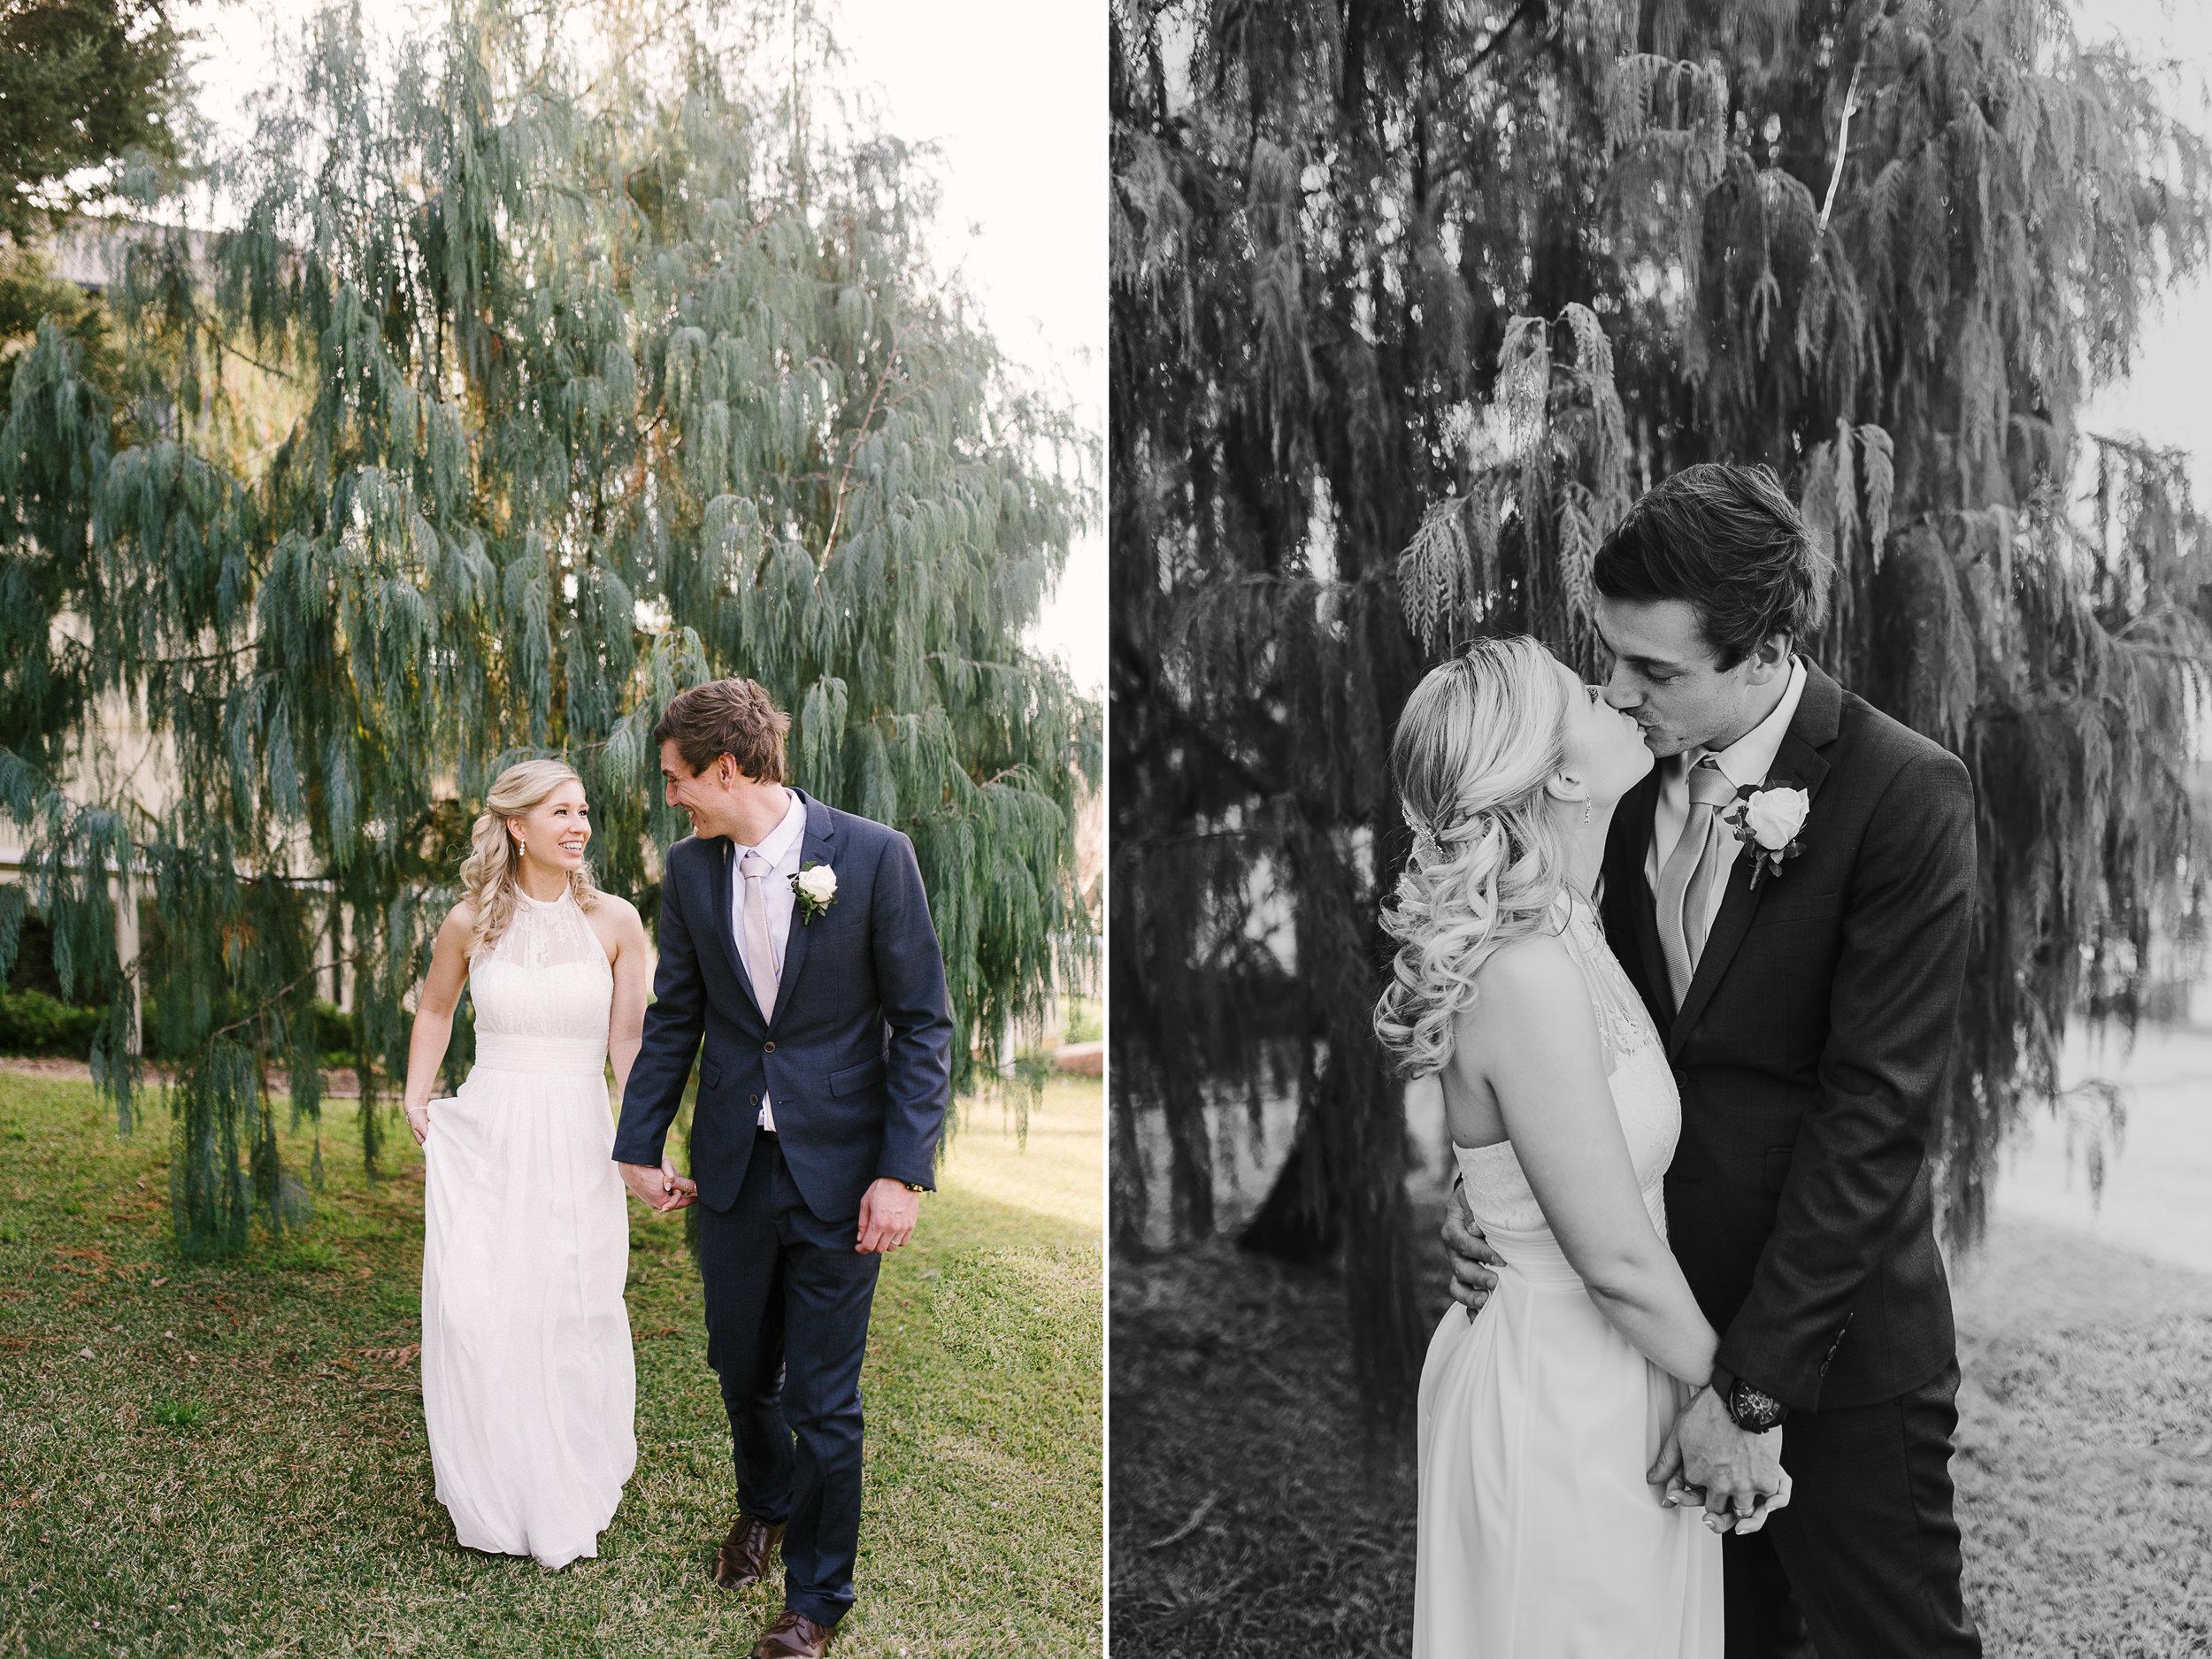 sydney-wedding-photographer-10.jpg